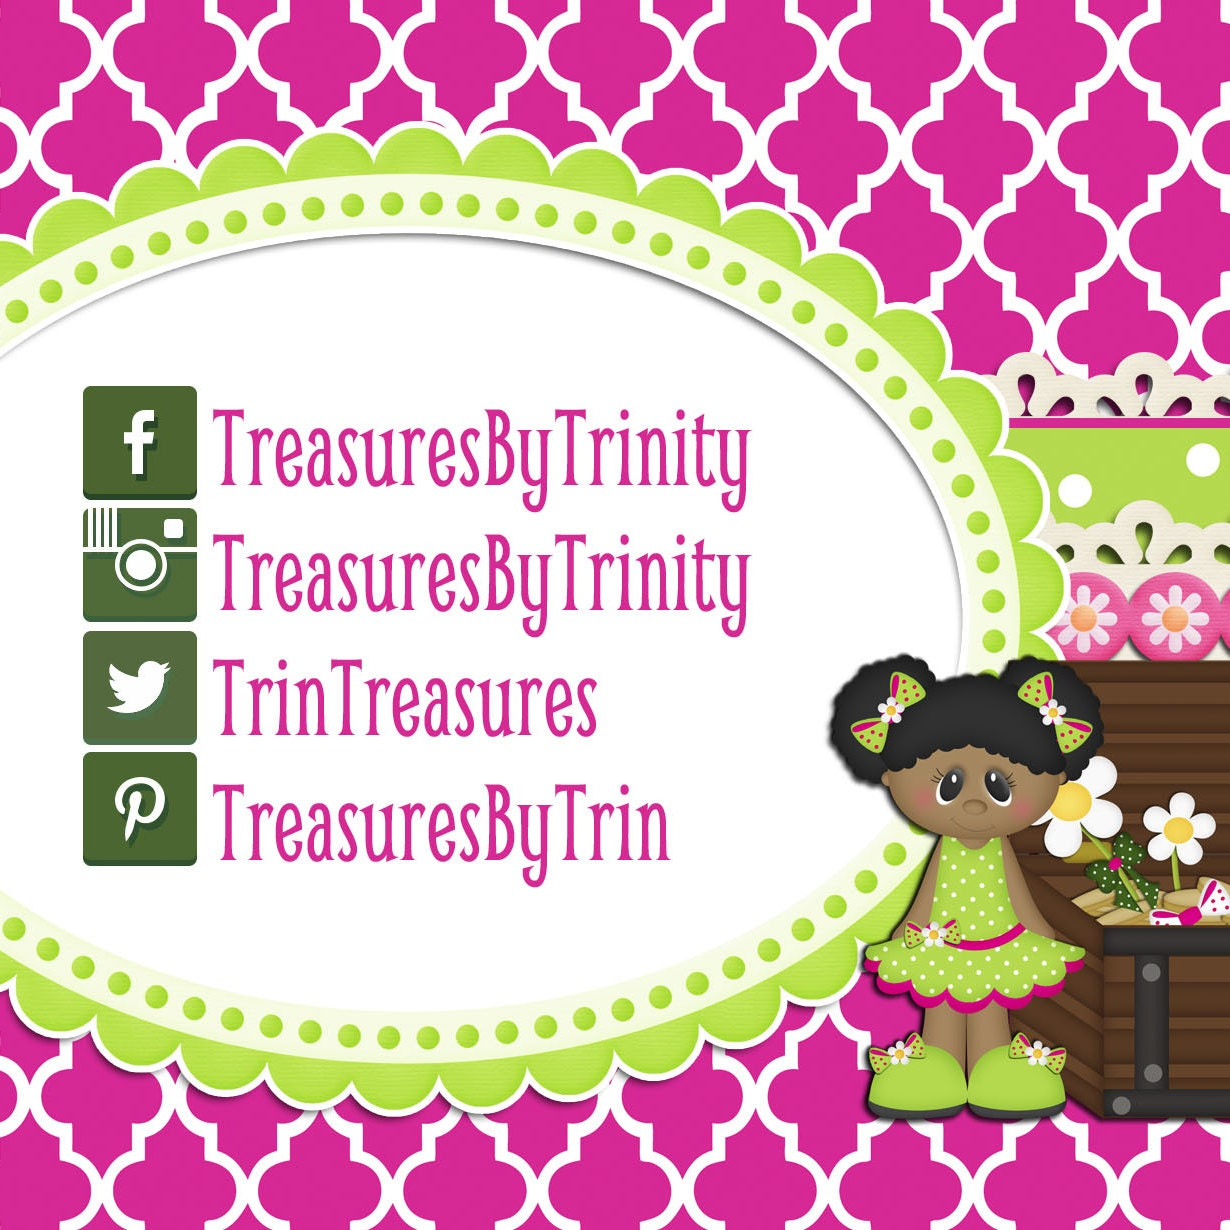 52ee2d6630 Trinity s Treasures LLC by TreasuresByTrin on Etsy